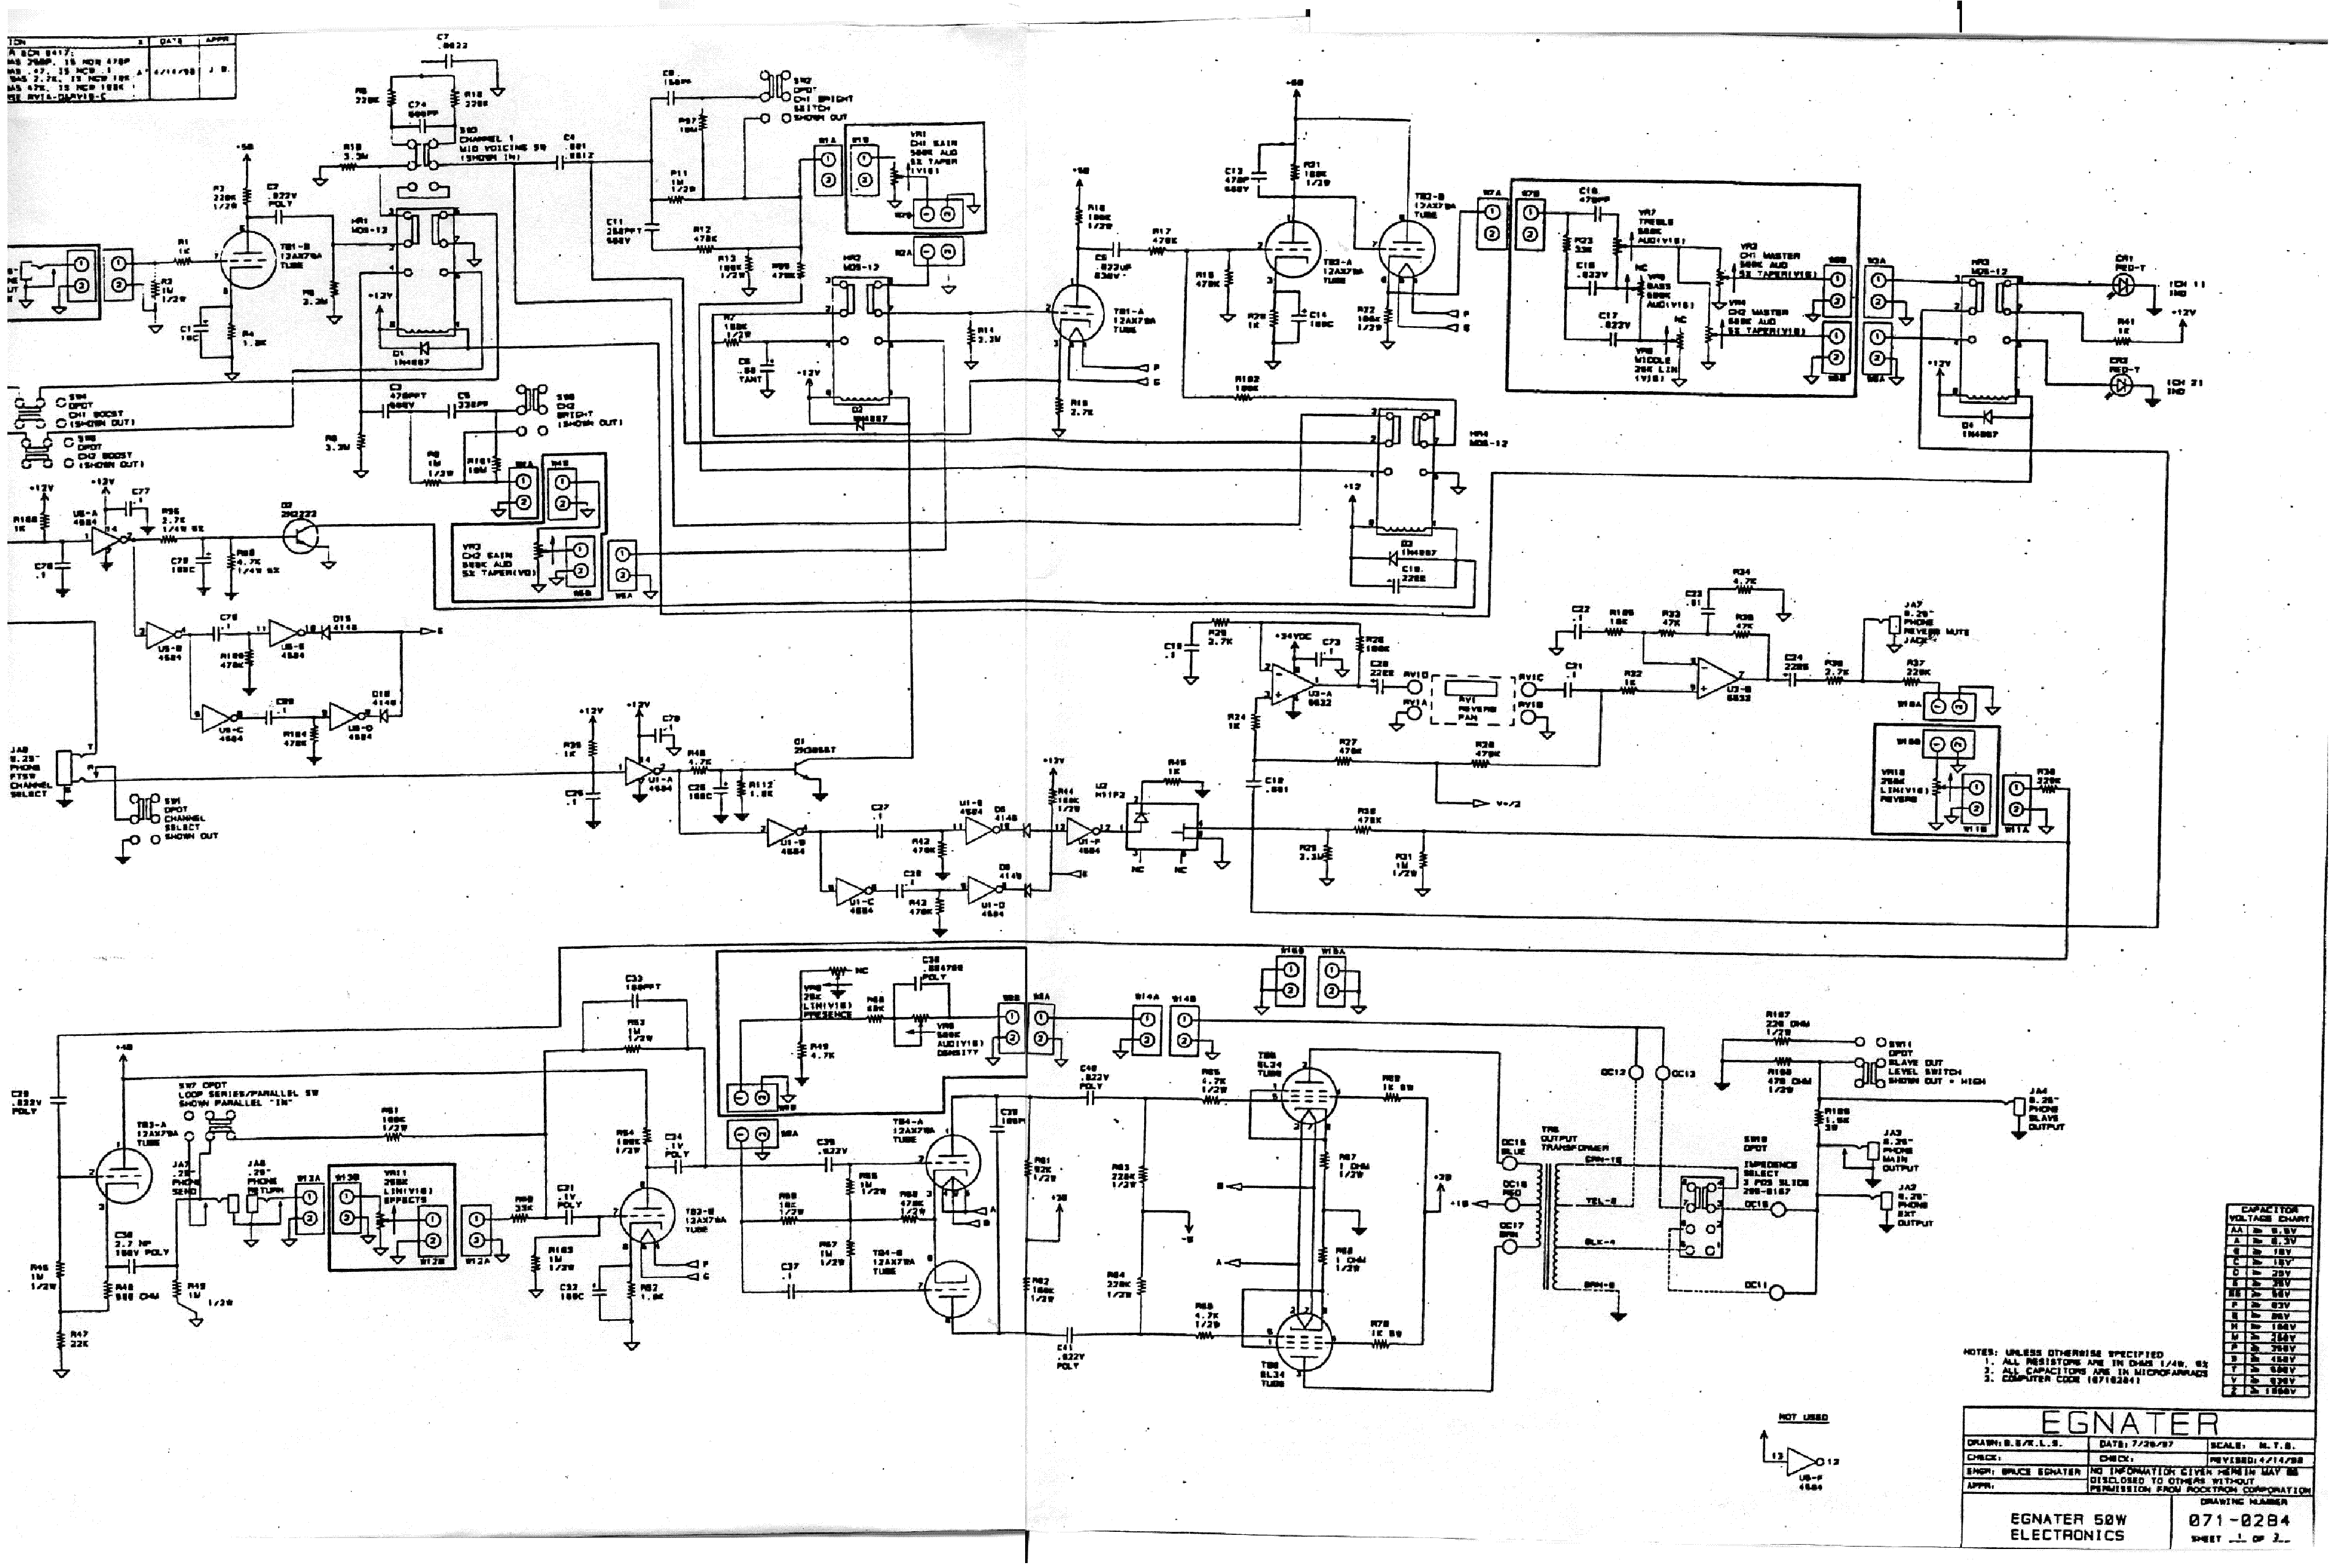 gmcs 130 alternator wiring diagram diagram on 2000